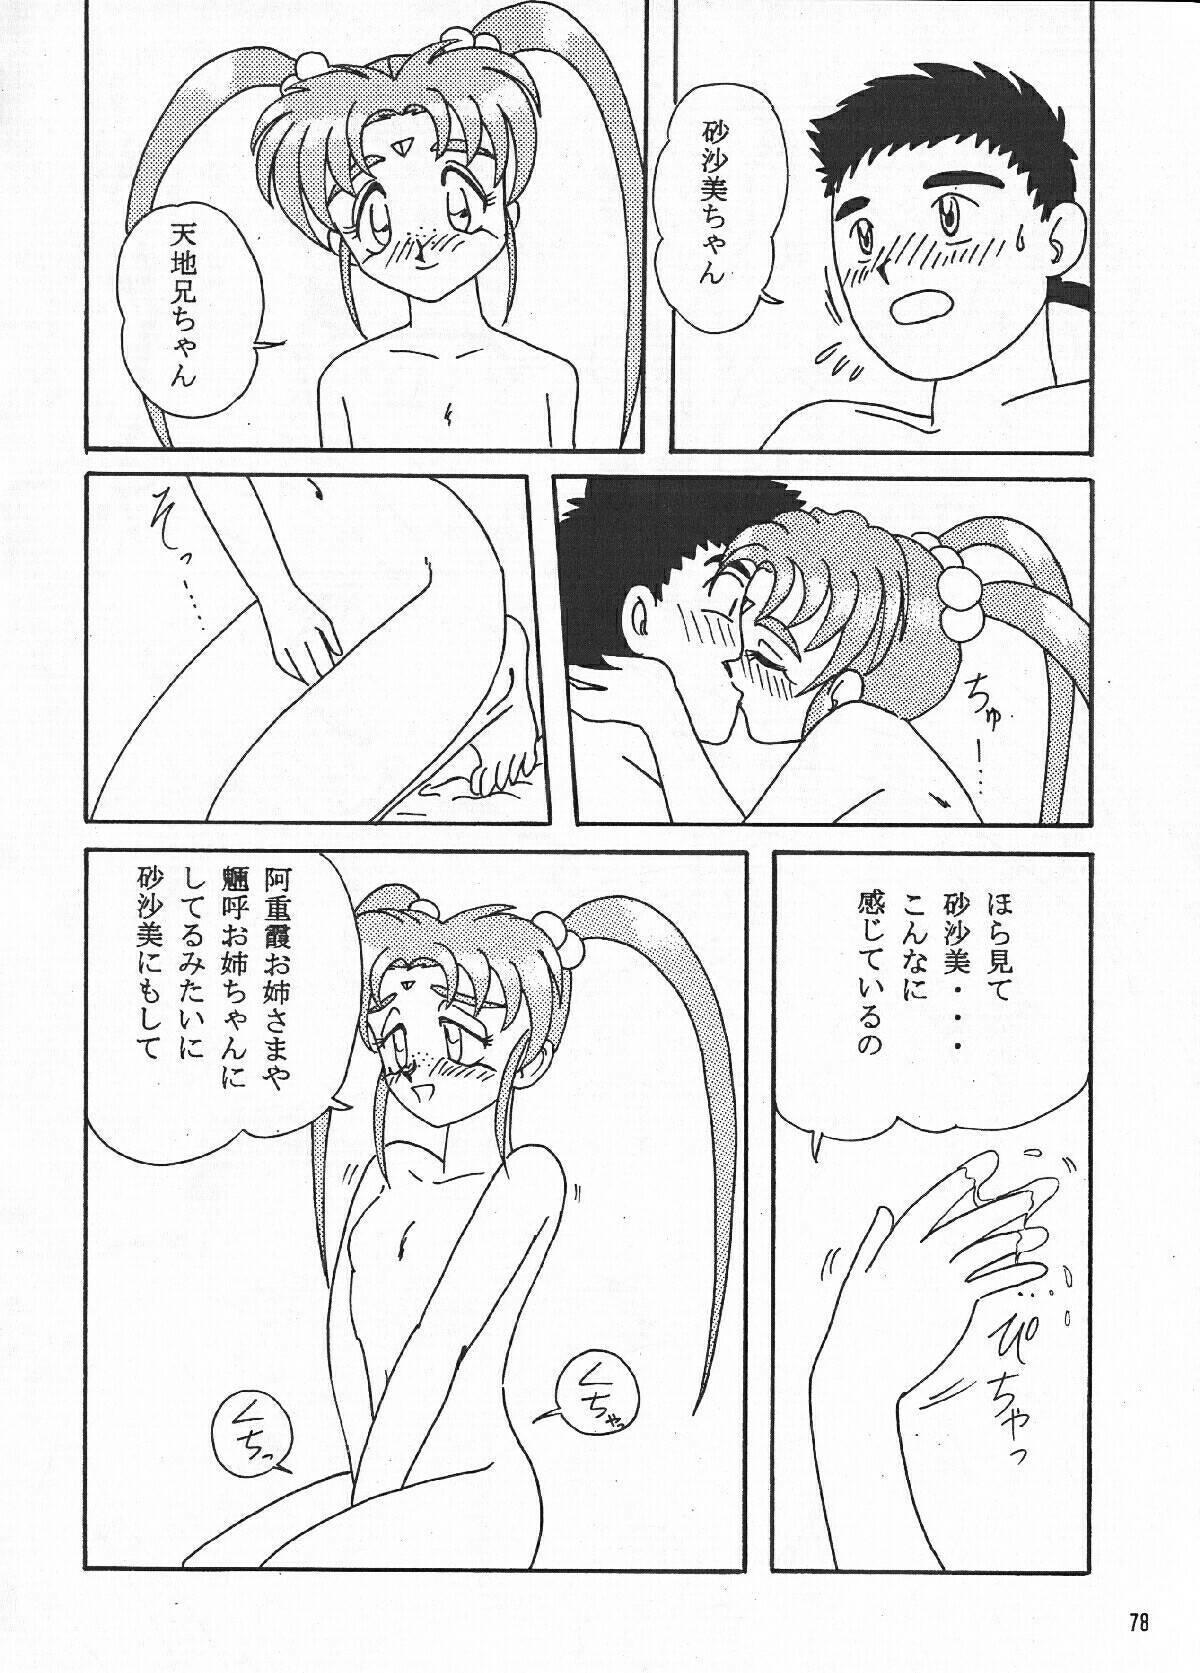 Hanjuuryoku XI 76